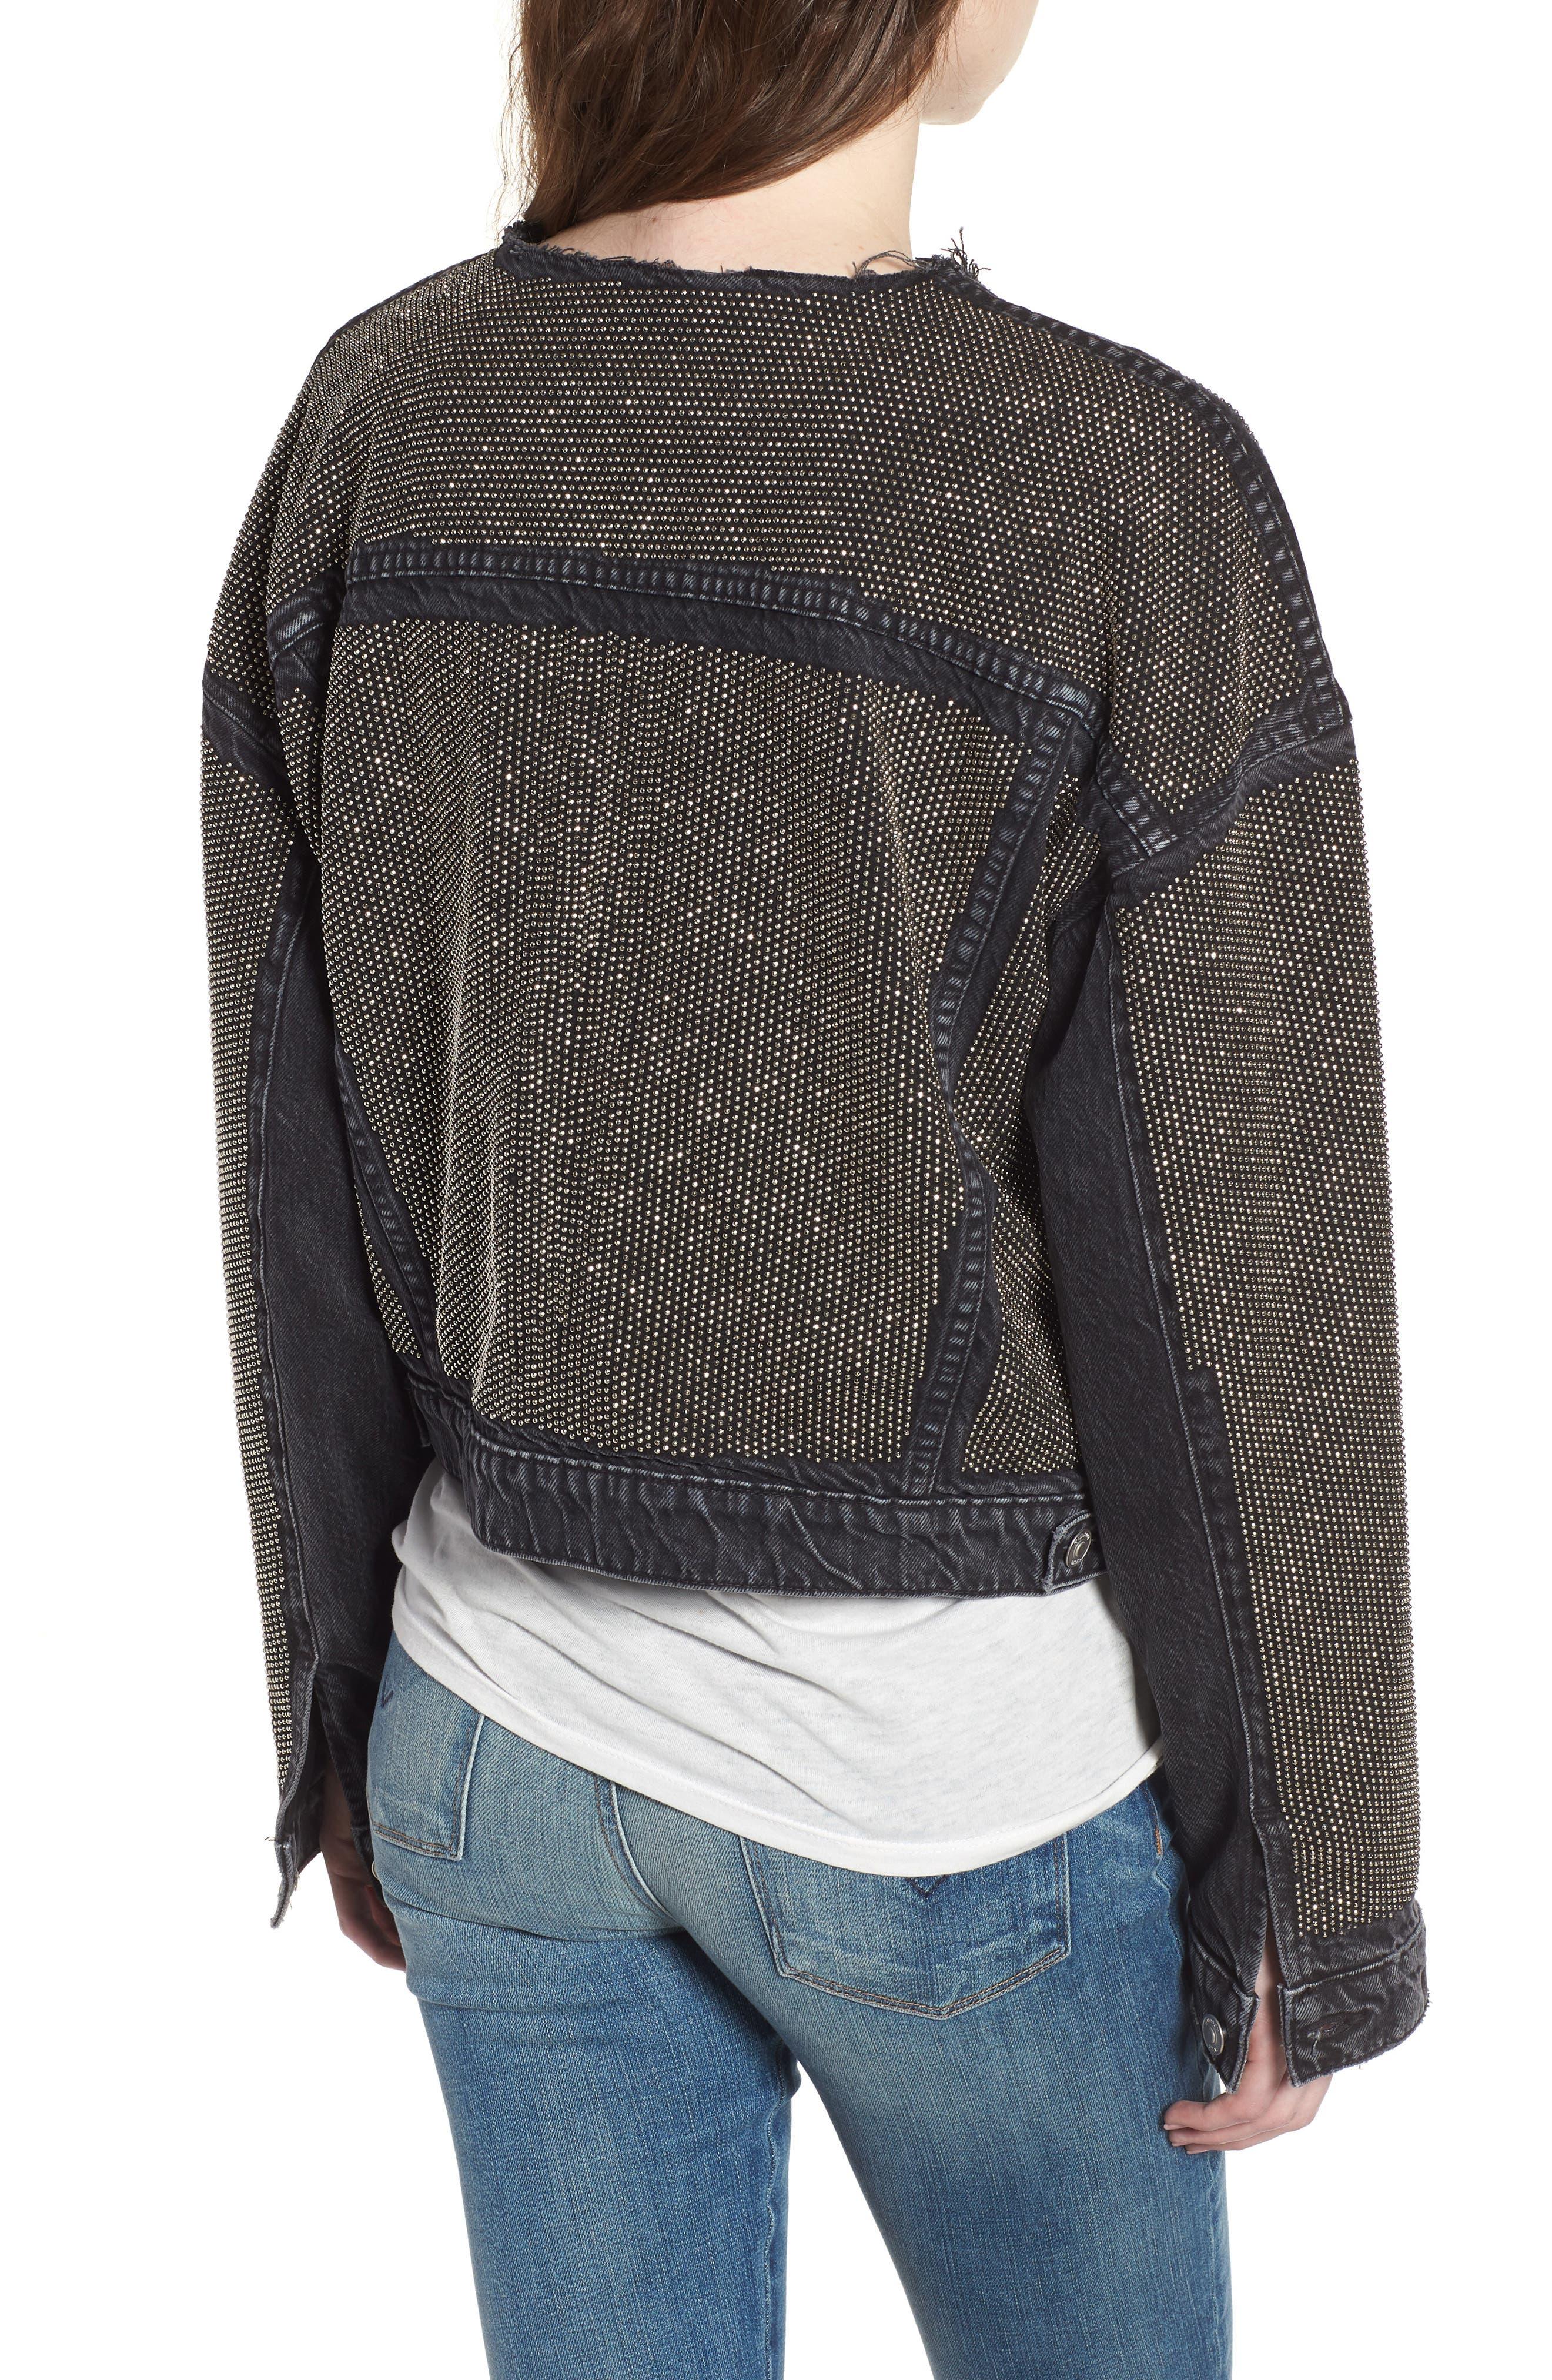 Rei Studded Crop Denim Jacket,                             Alternate thumbnail 2, color,                             001